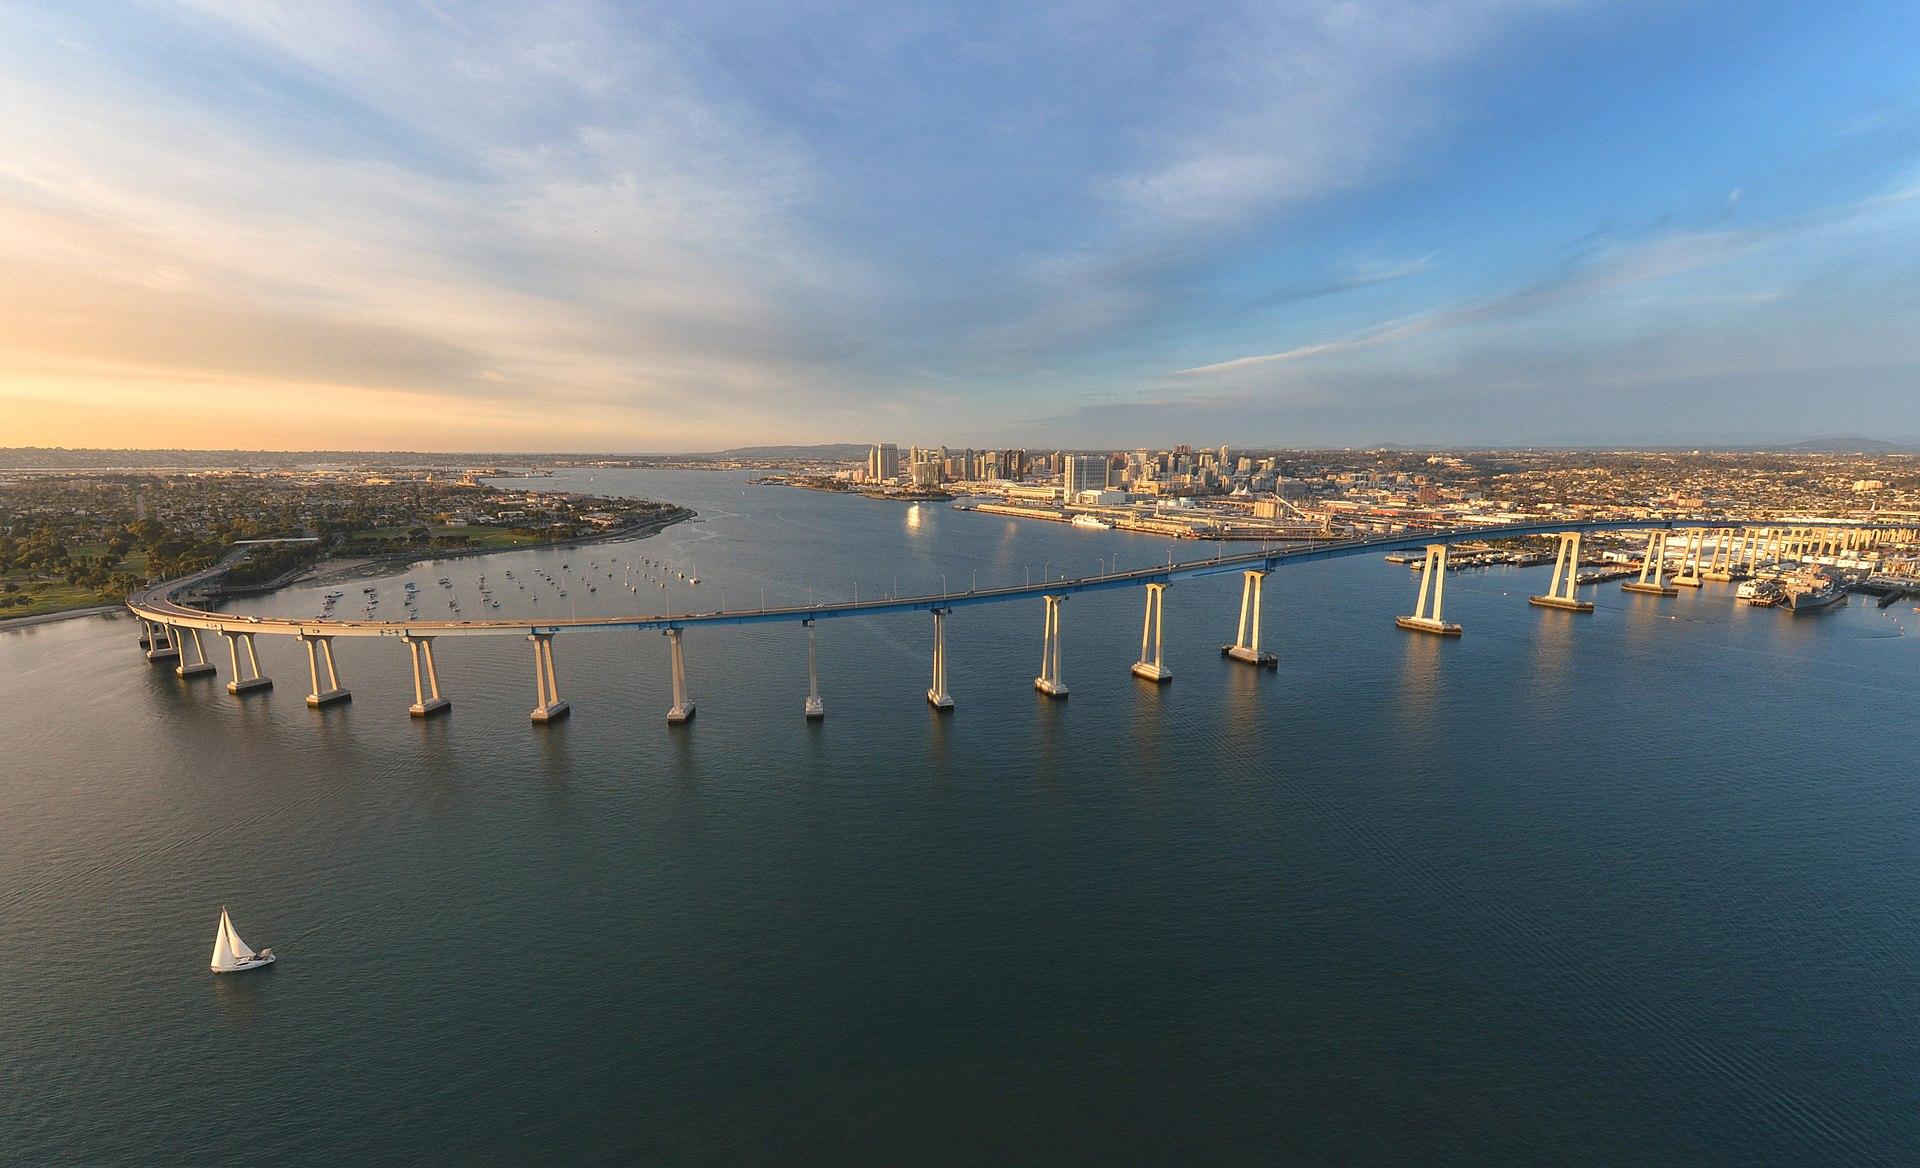 San Diego-Coronado Bridge by Frank Mckenna.jpg